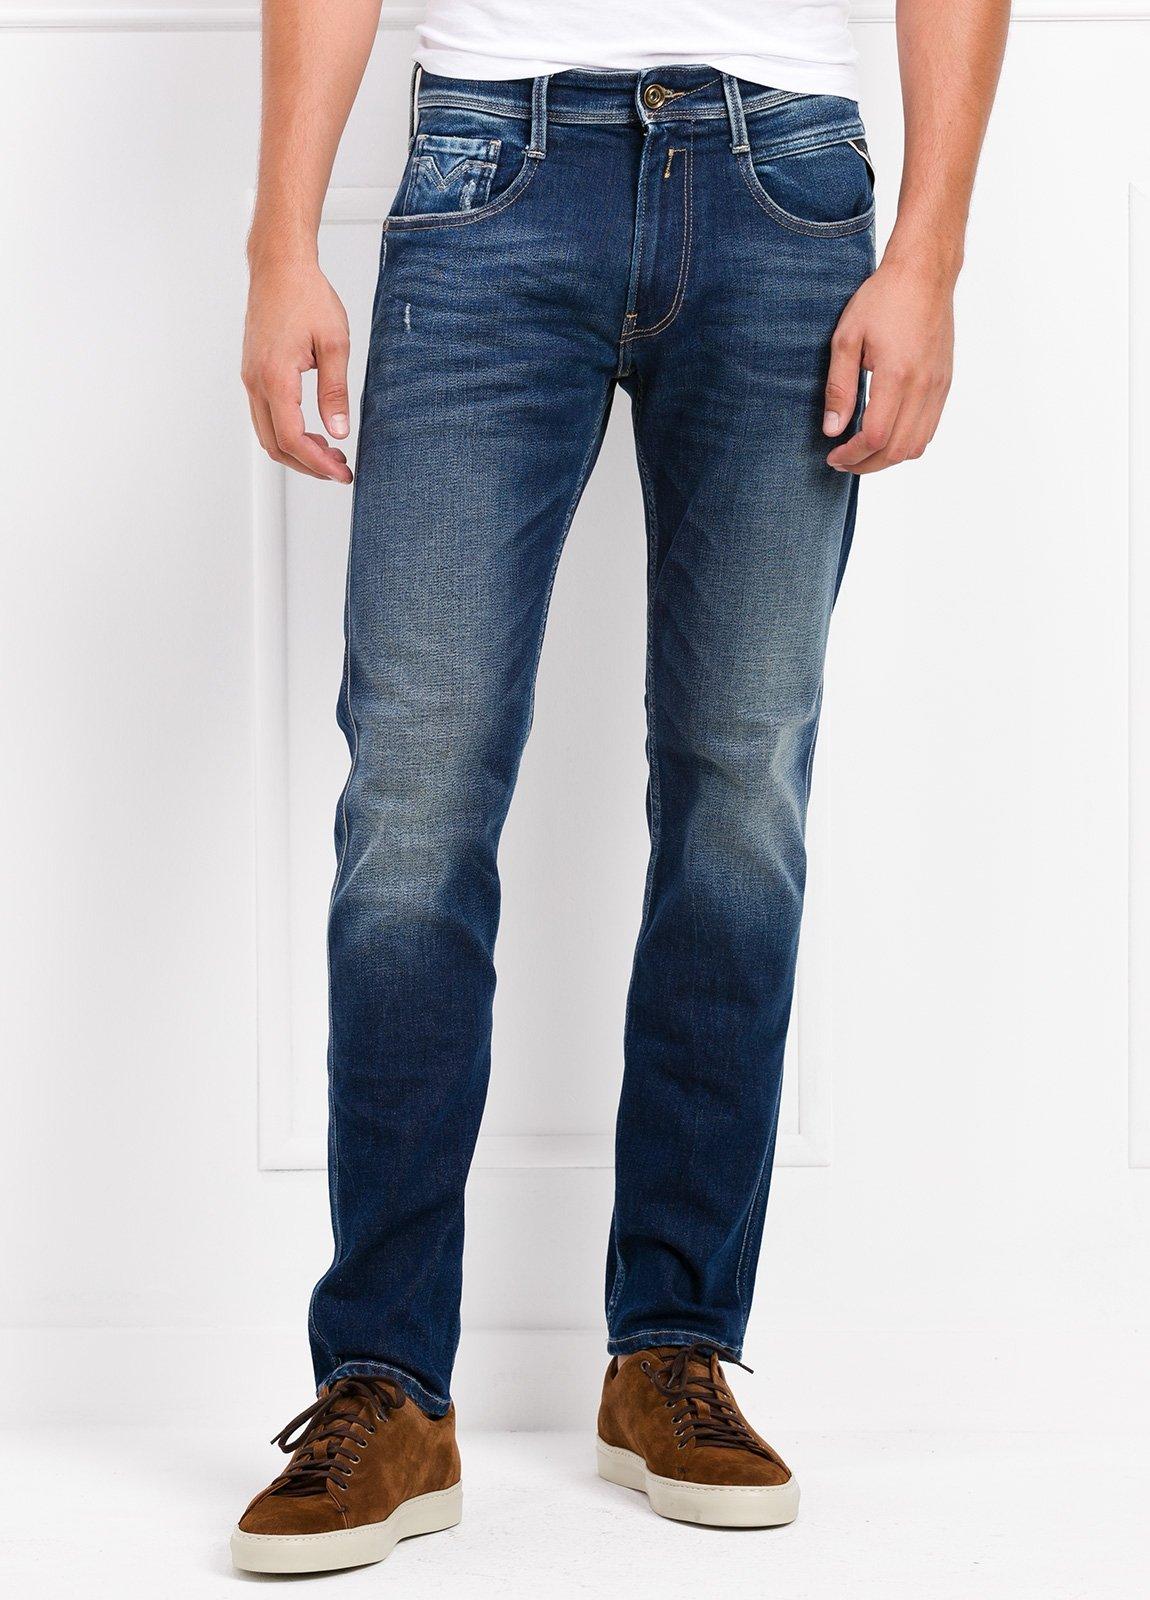 Pantalón tejano 12,5 oz SLIM 914J ANBASS color azul lavado. 98% Algodón. 2% Elastano.